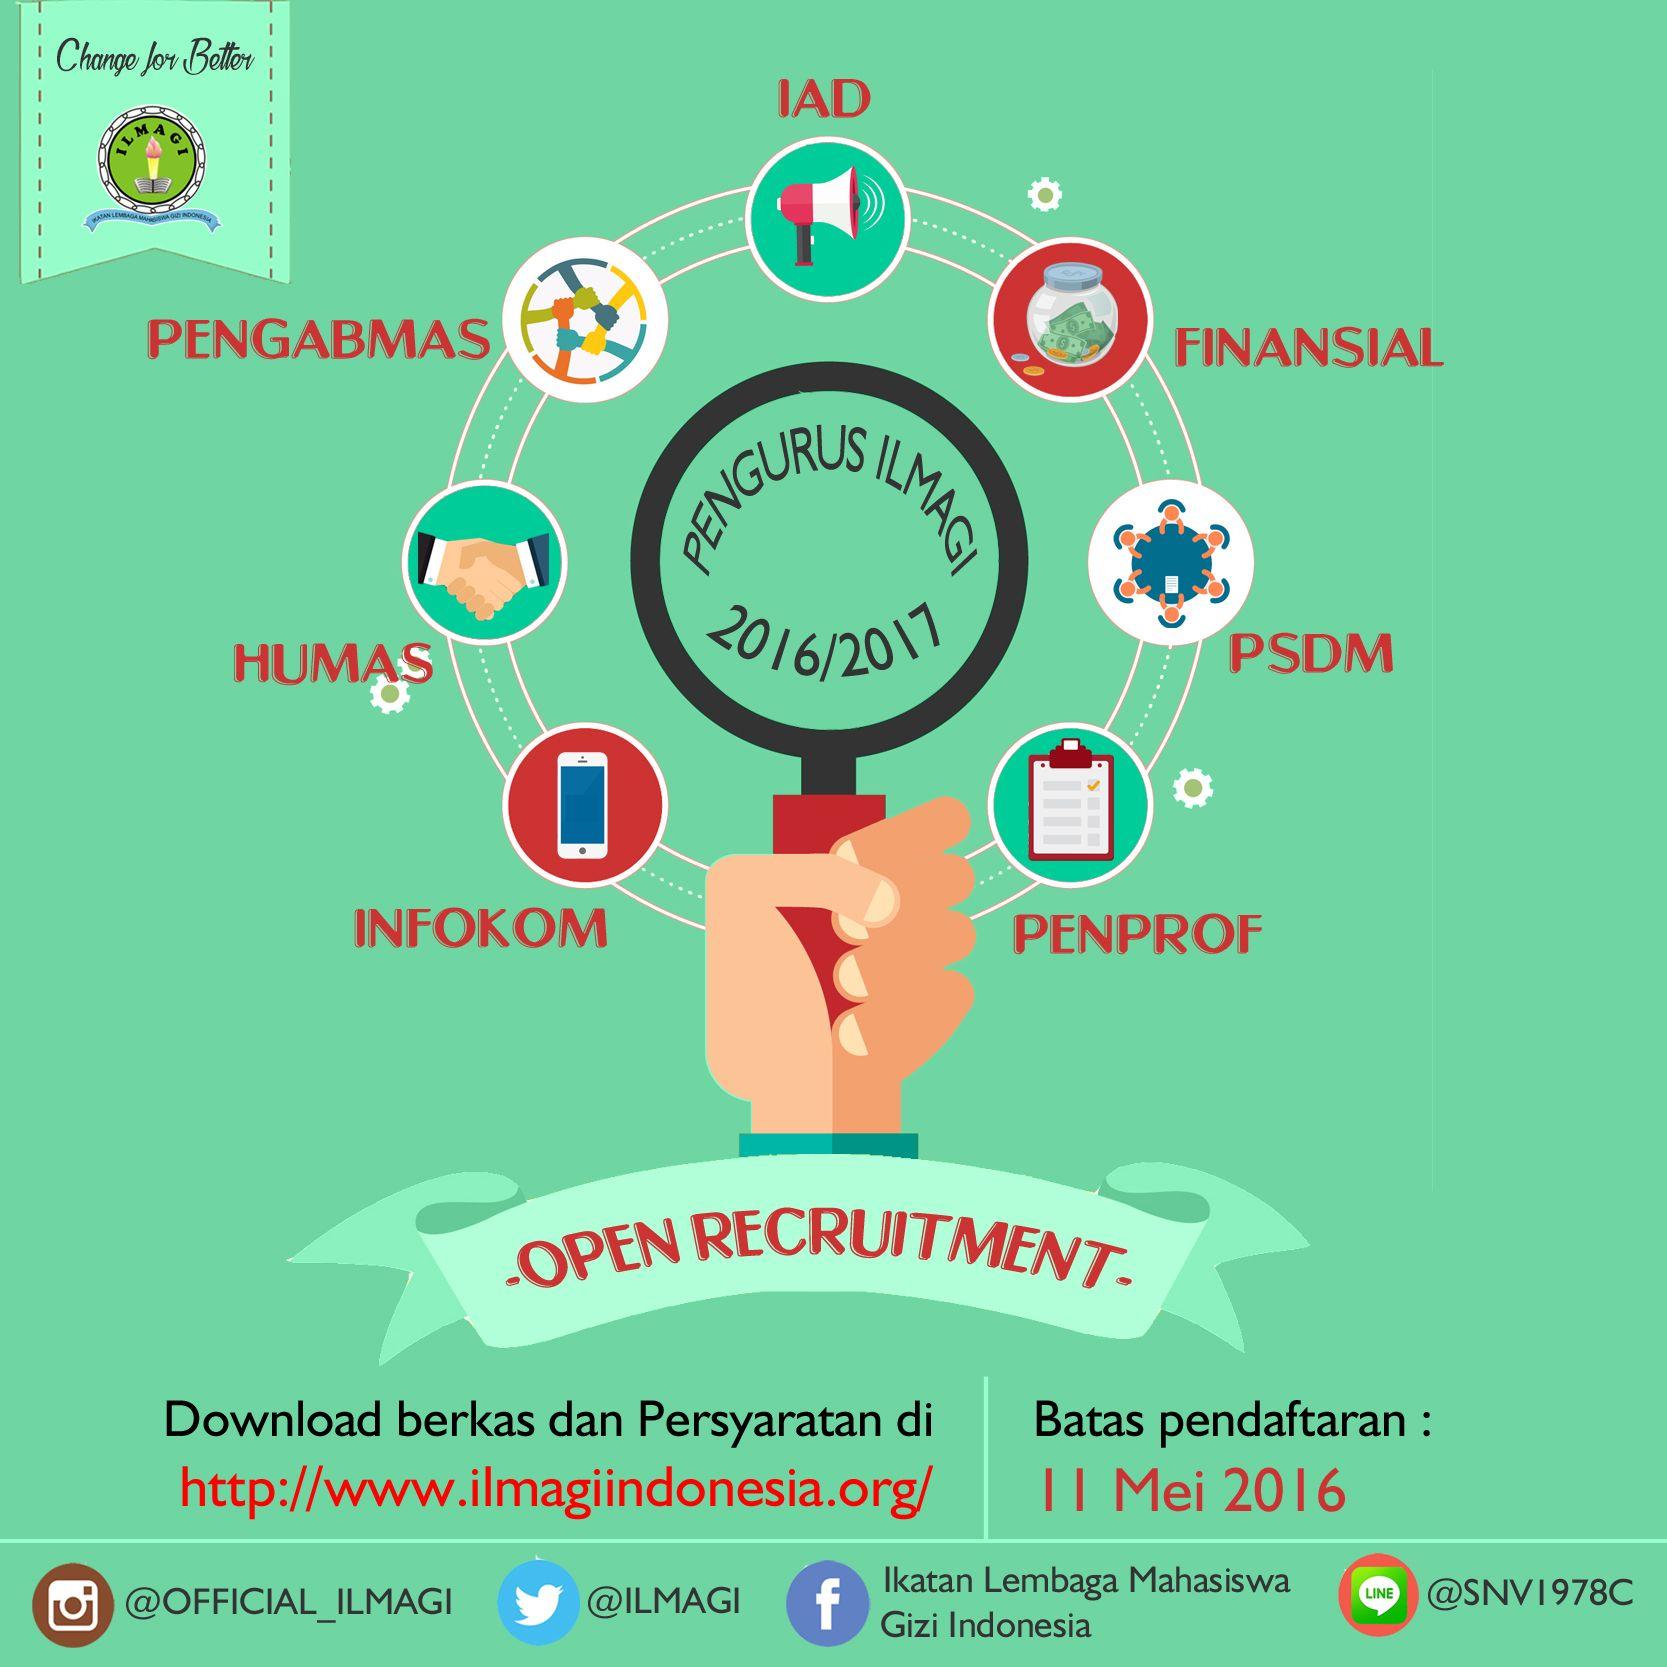 open recruitment poster Google Search Humas, Mahasiswa